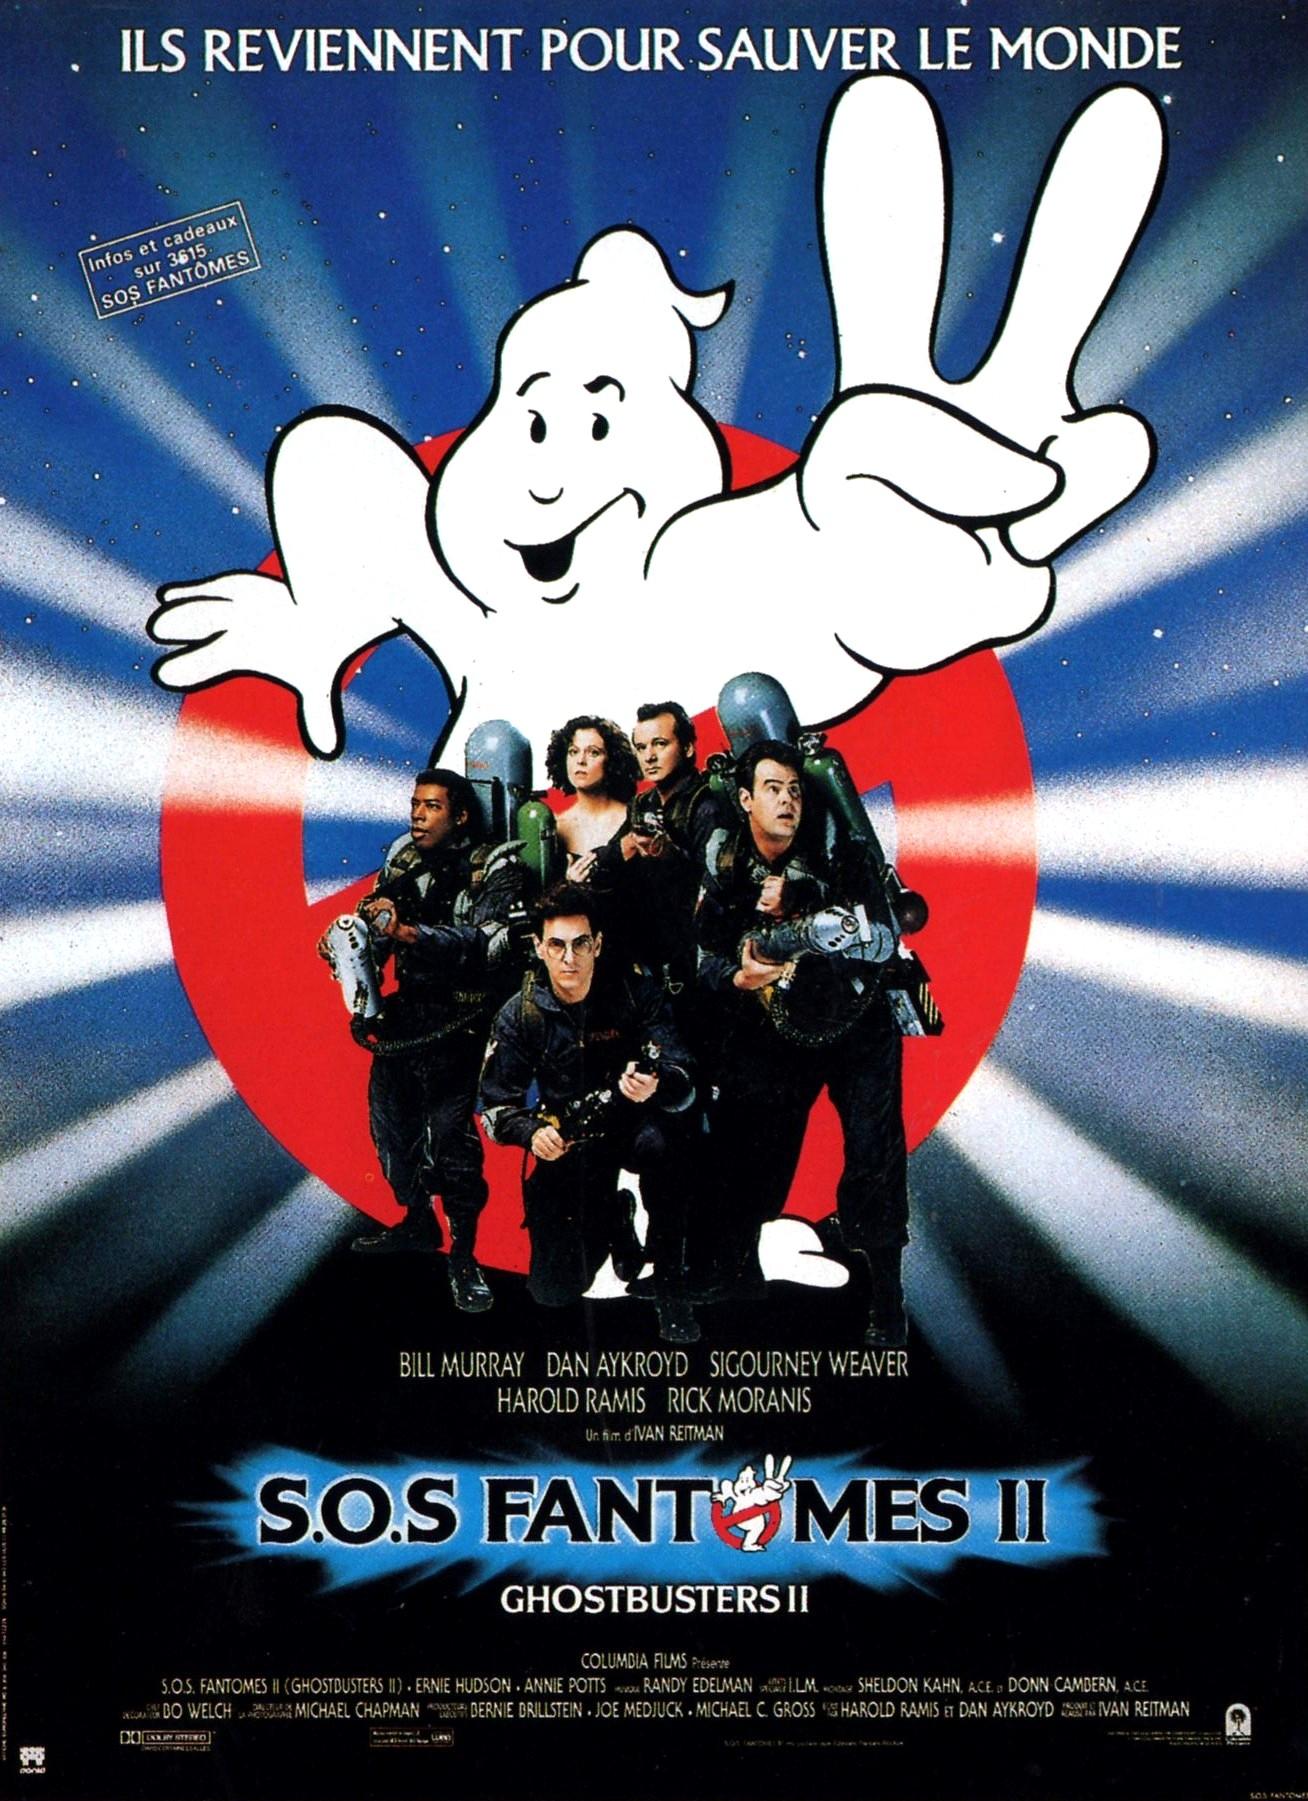 affiche du film S.O.S. Fantômes II